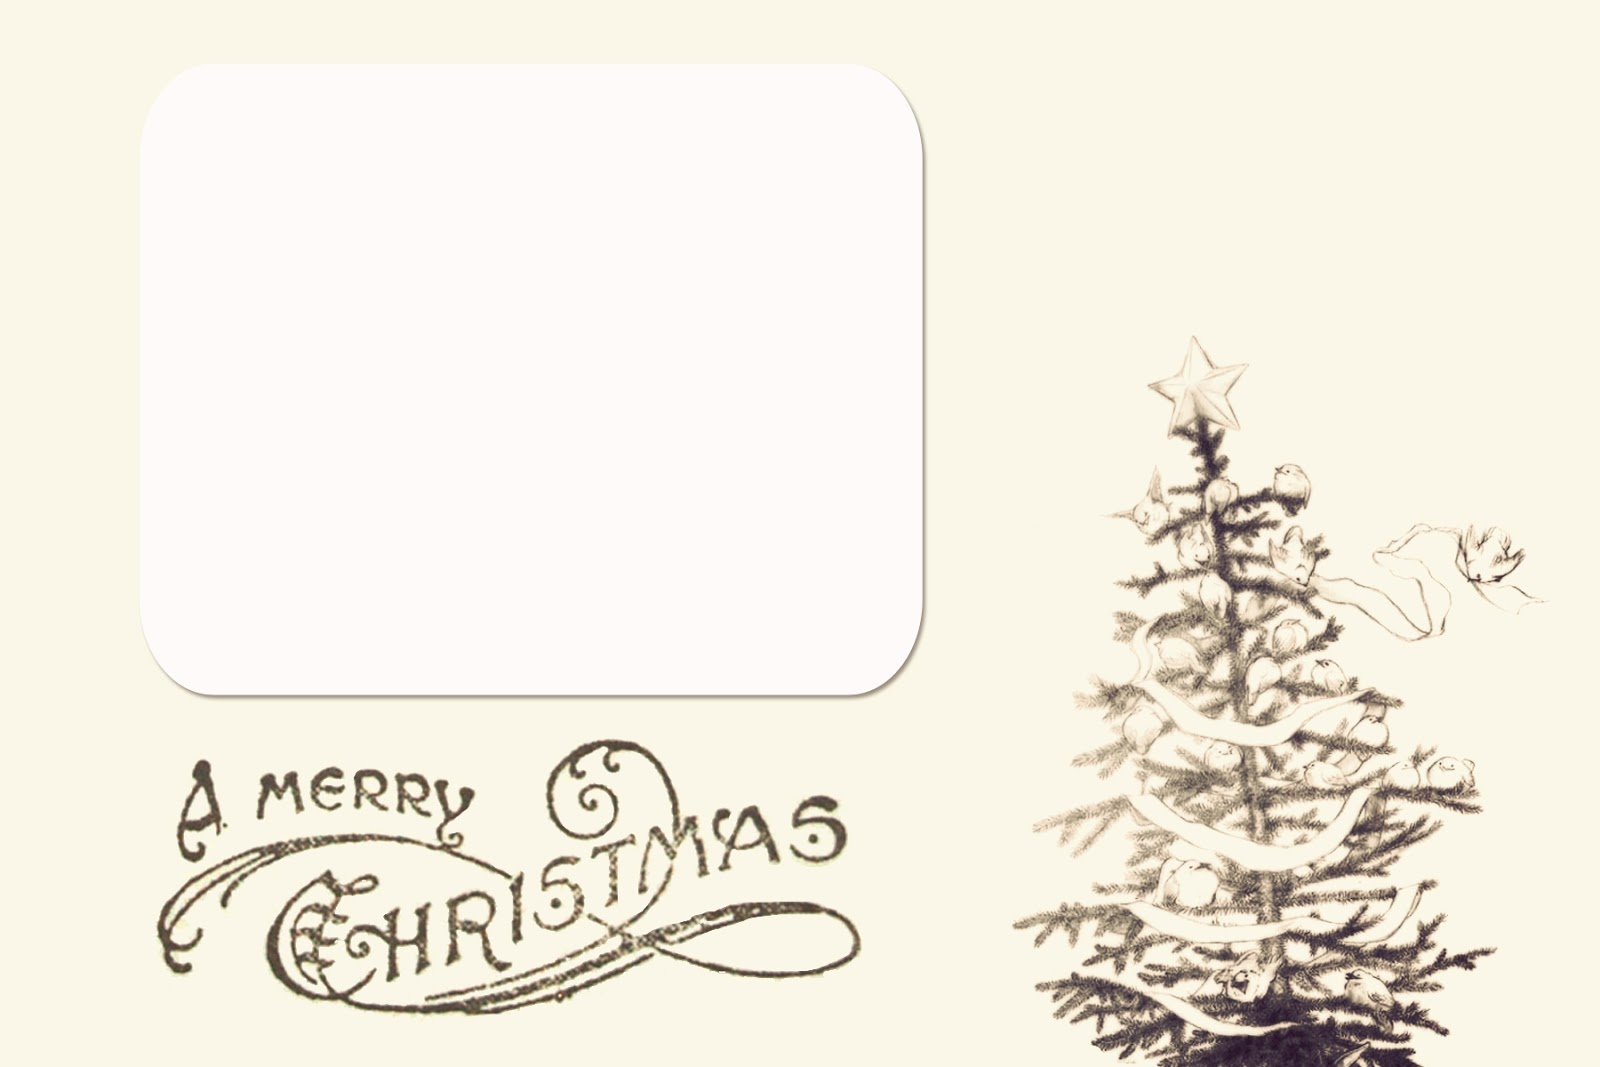 004 Free Christmas Card Templates Template Ideas Wonderful Printable - Free Printable Christmas Card Templates